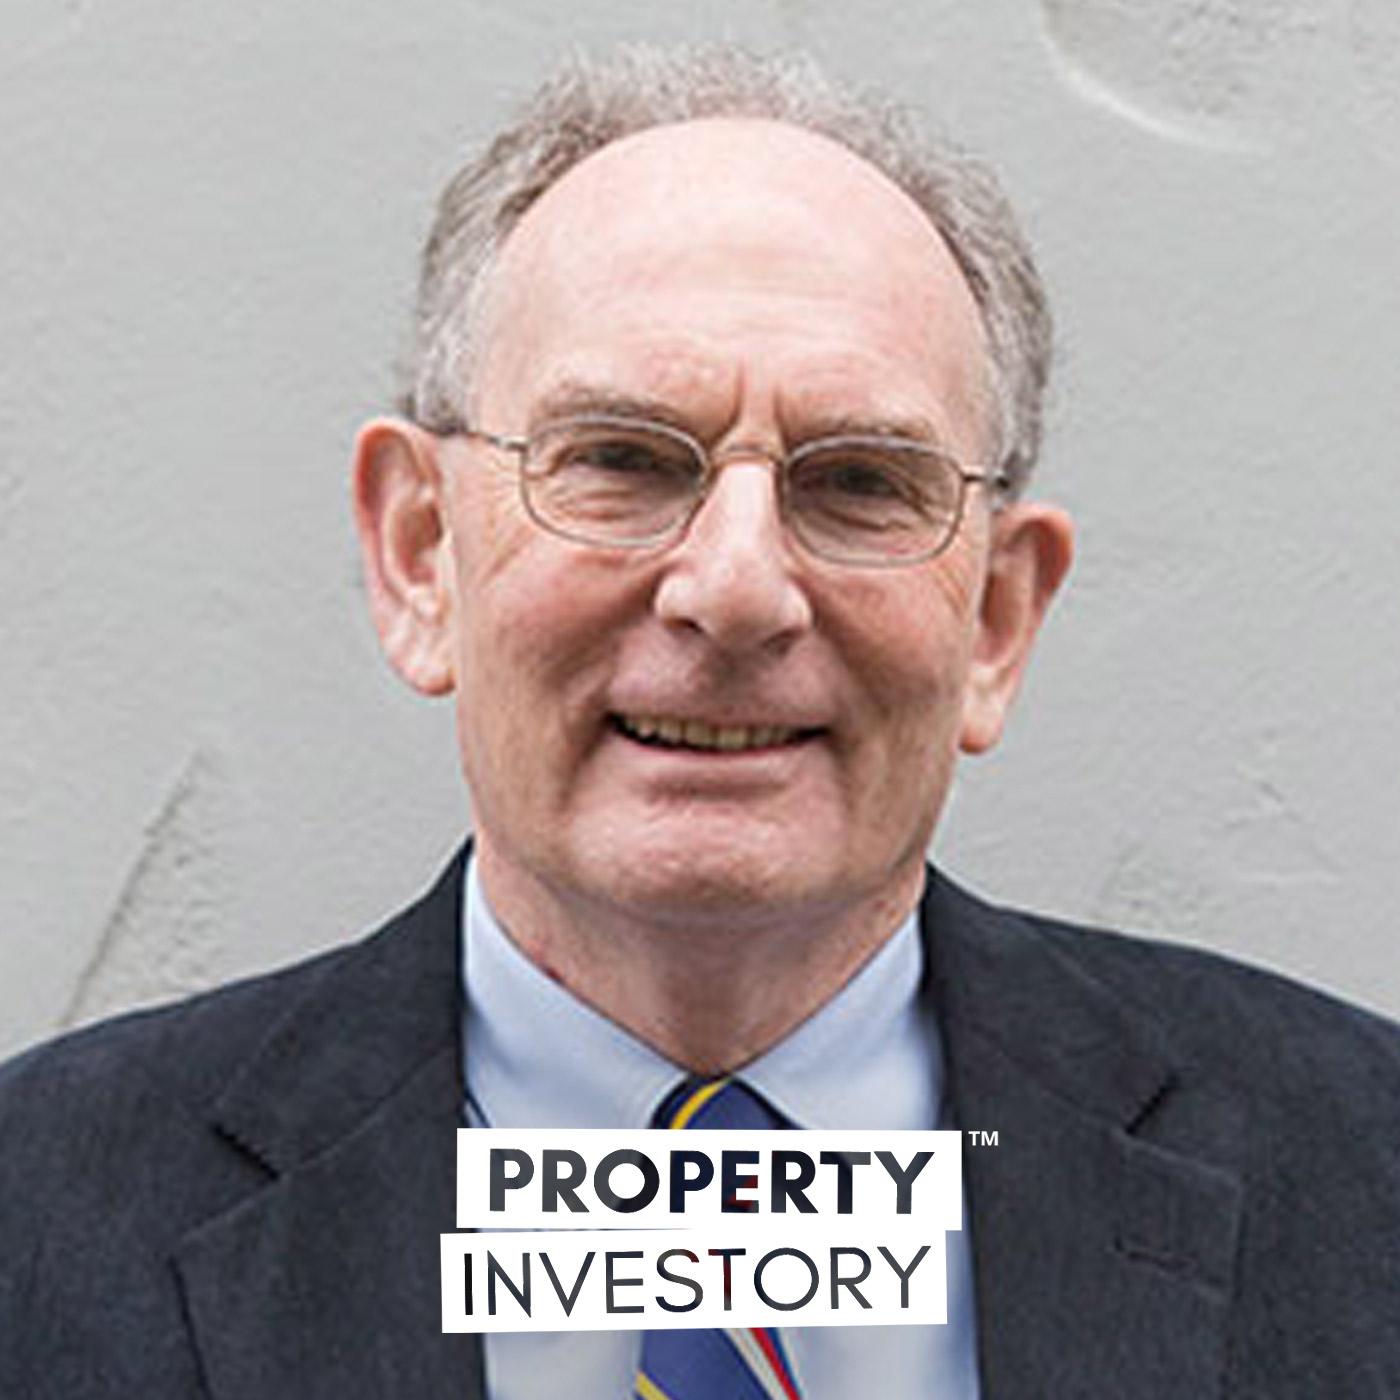 Chris Lang's Nine-Step Investment Formula For Commercial Property